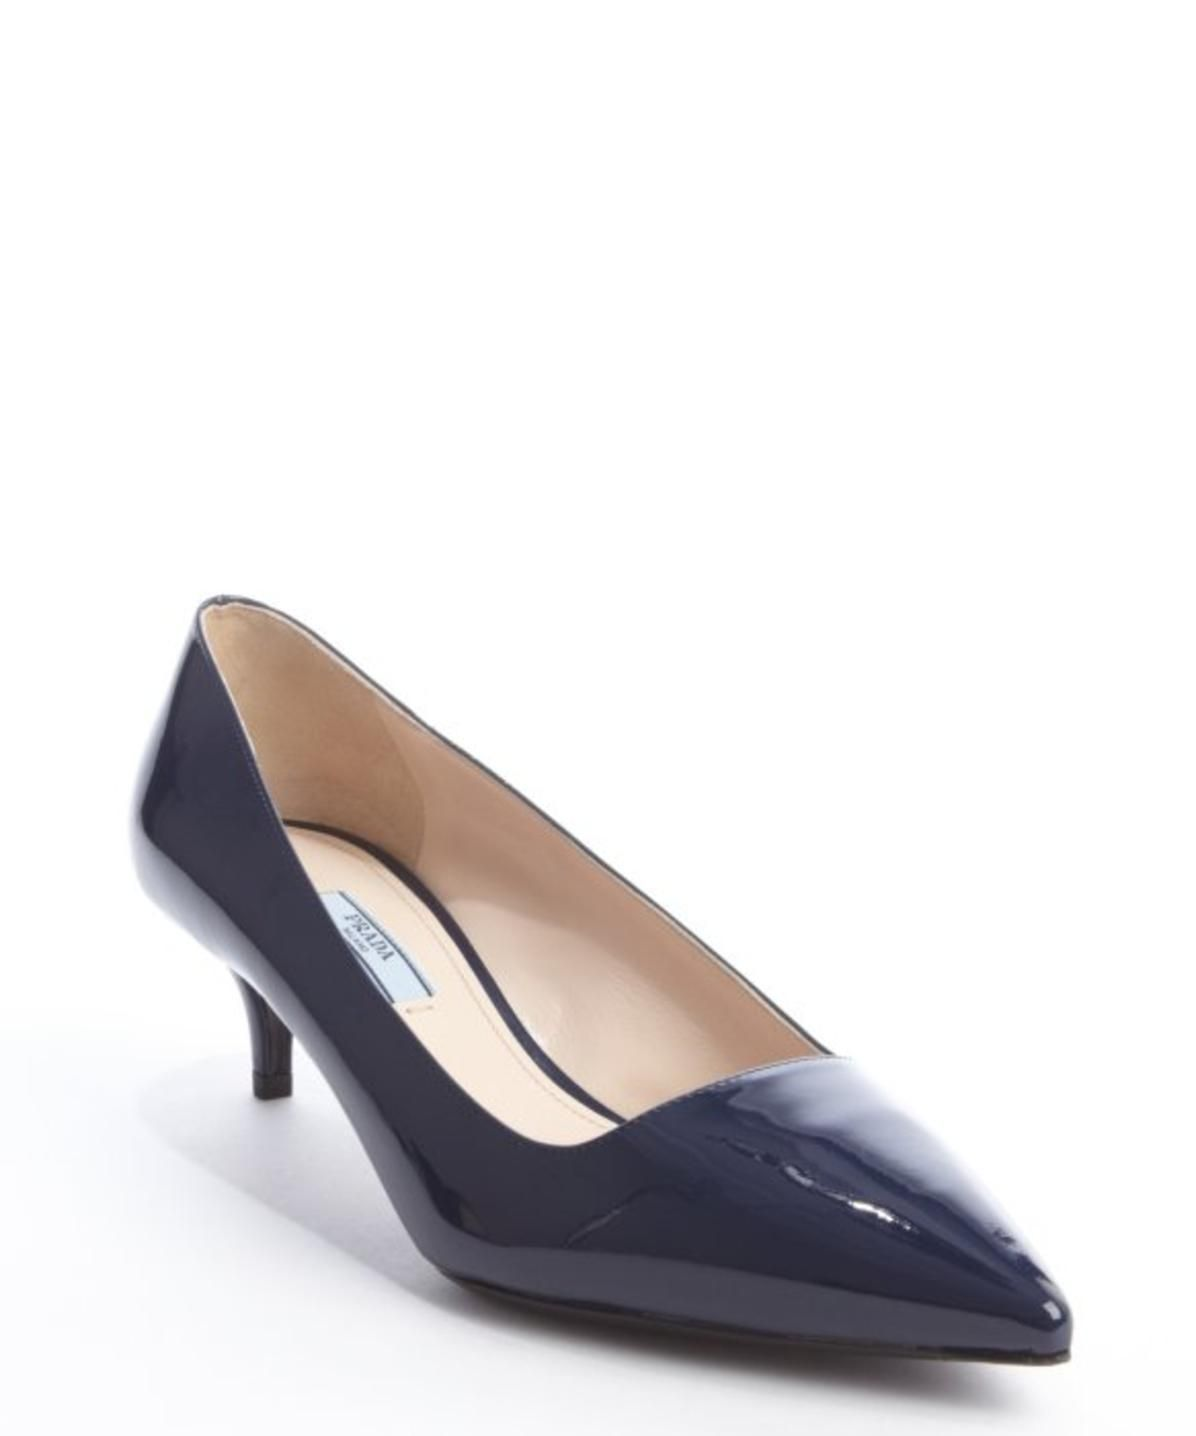 royal blue patent leather point toe kitten heel pumps http   picvpic.com